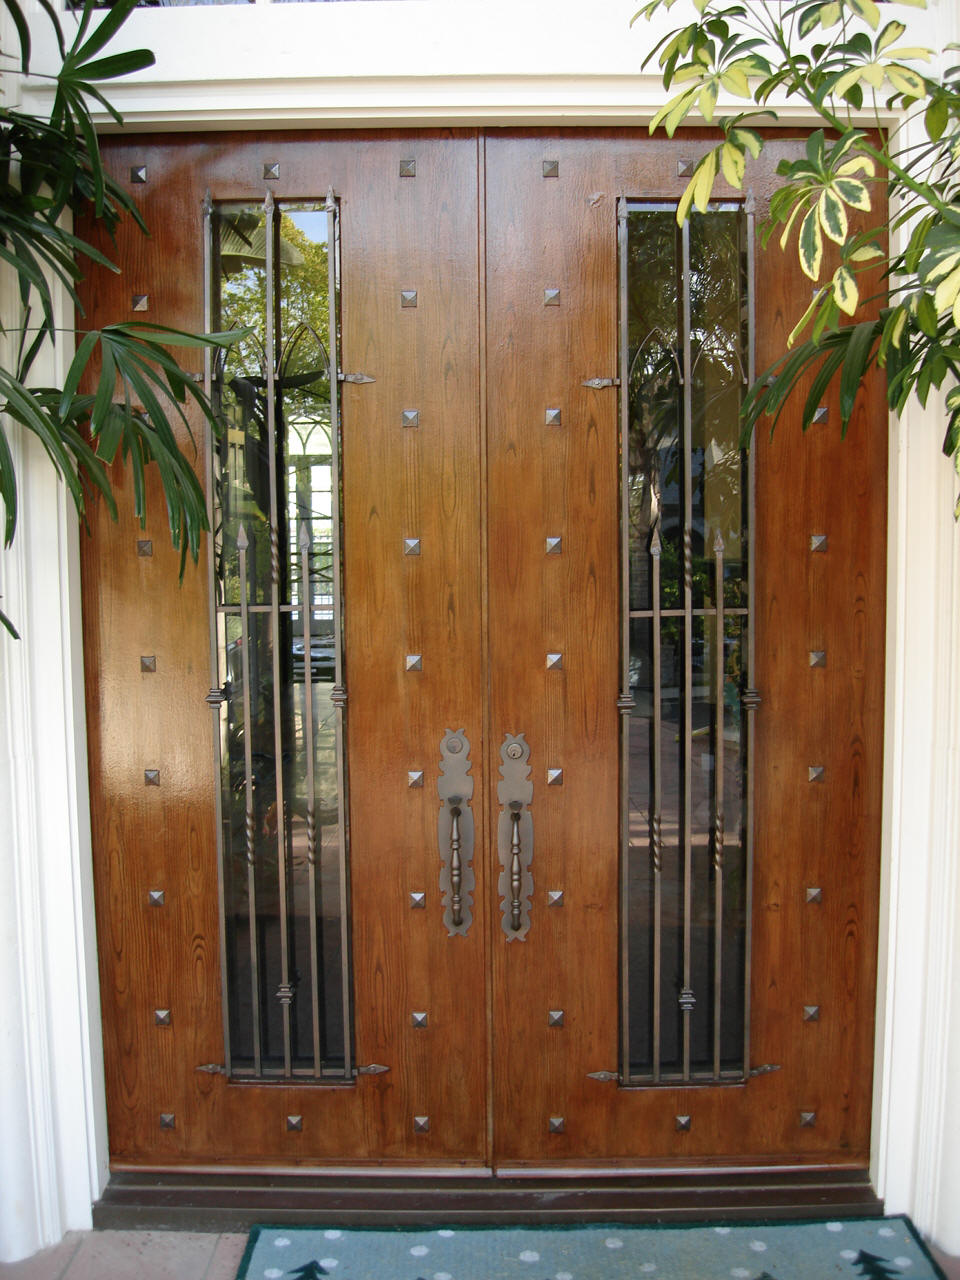 Choosing an Entry Door